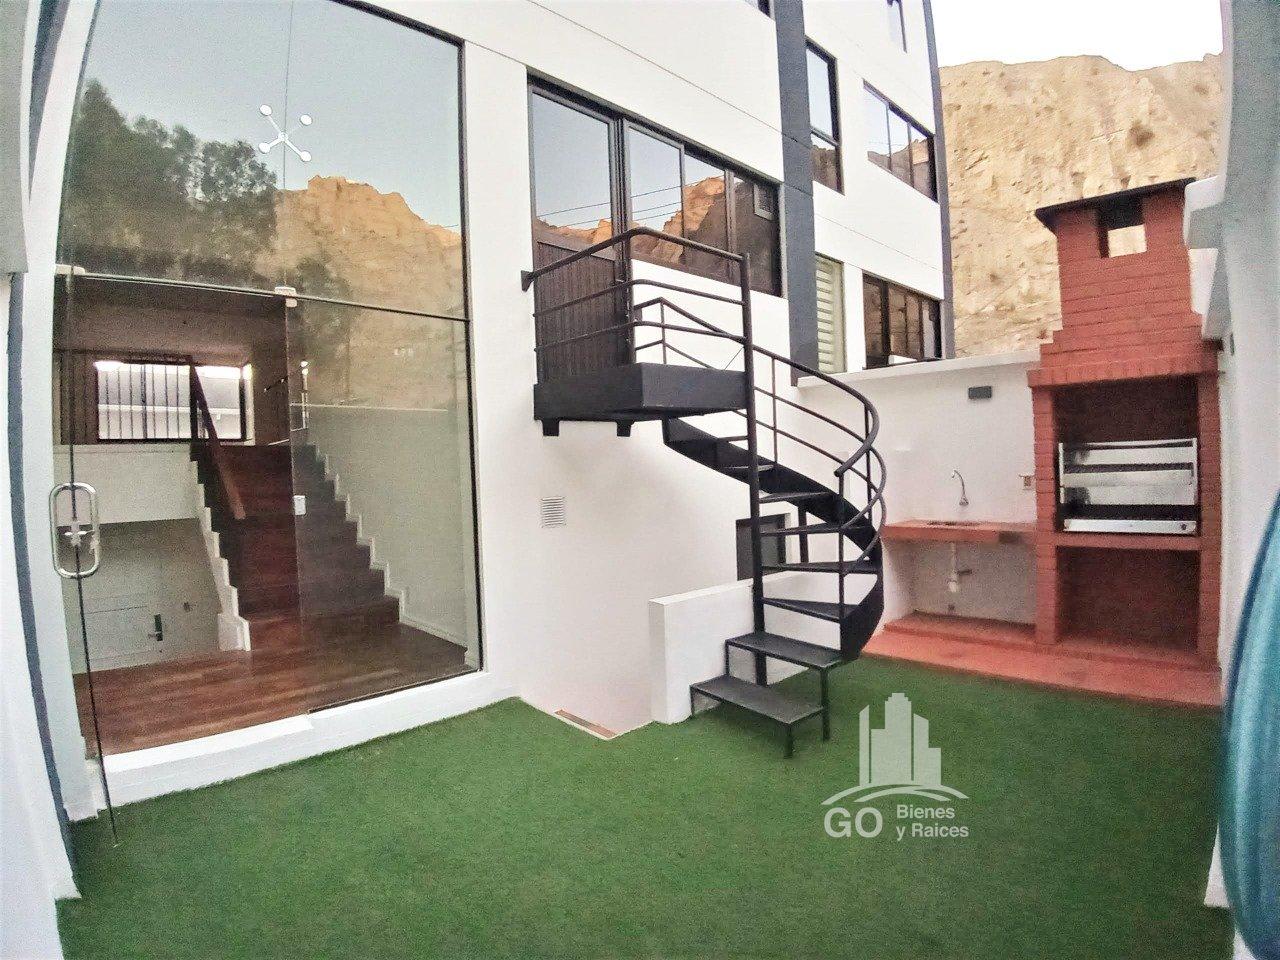 Casa en Venta ACHUMANI, Av. Alexander, La Paz Foto 6